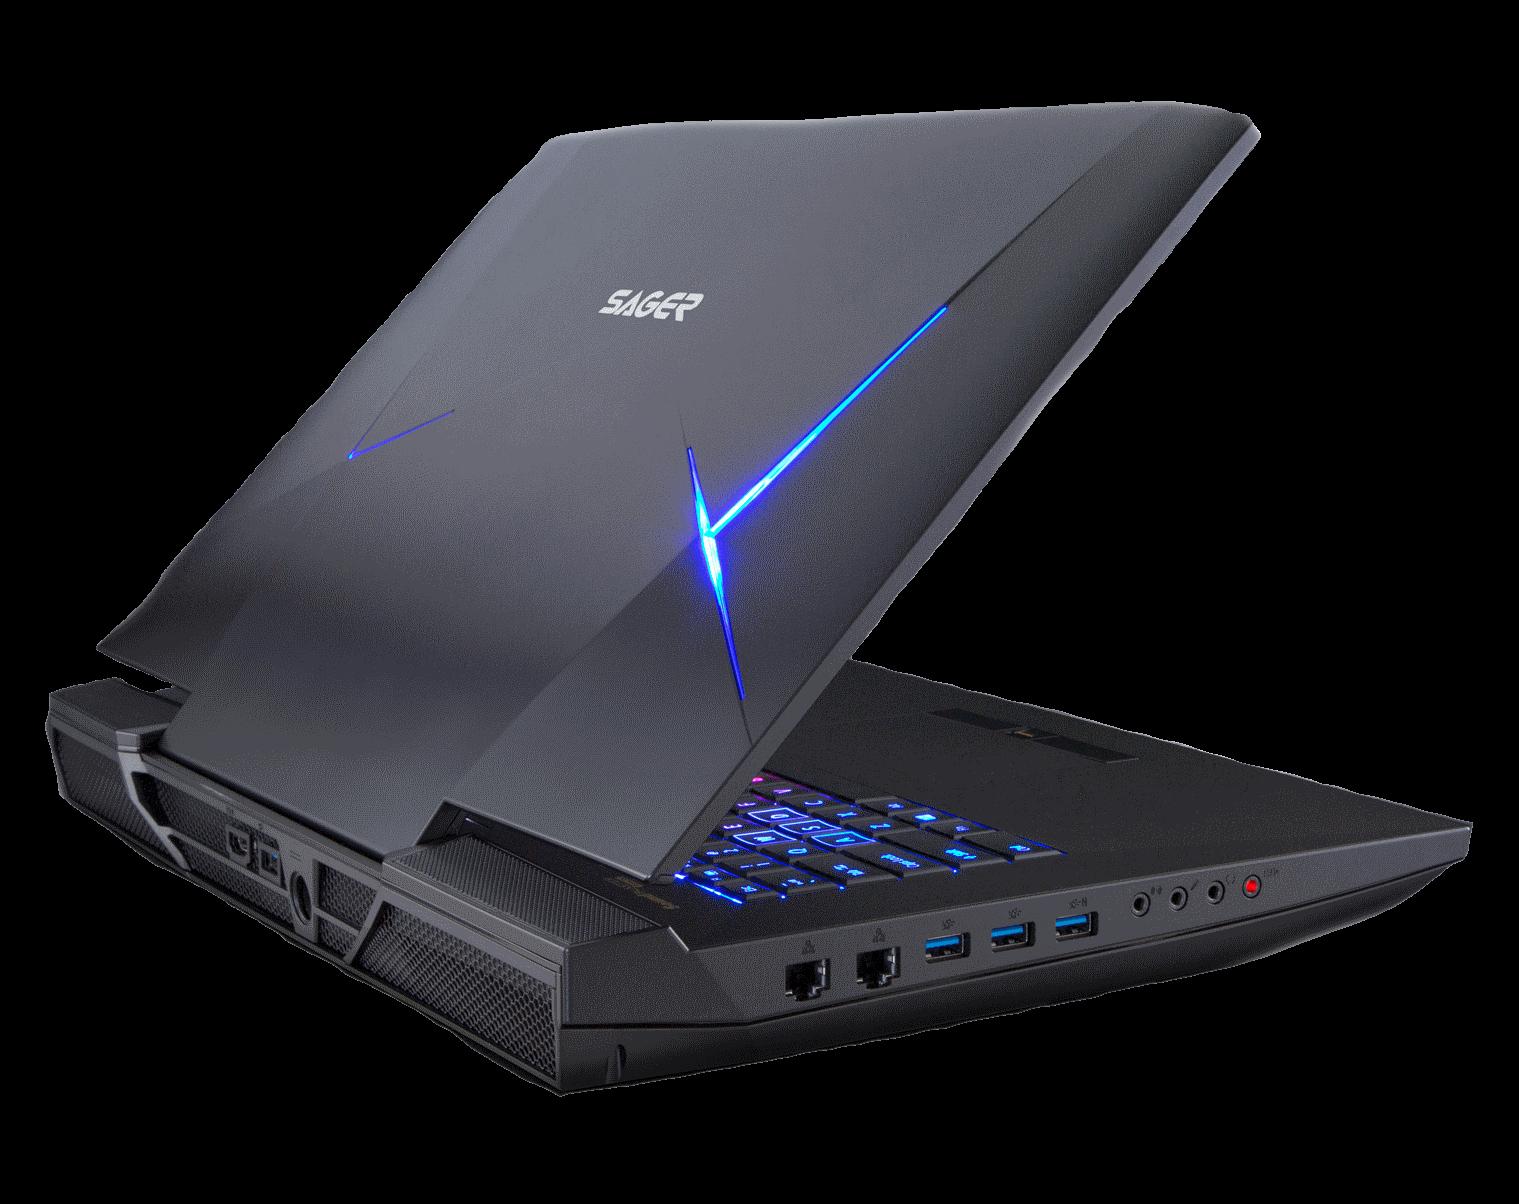 Cognitech Software on Sager Gaming Laptops